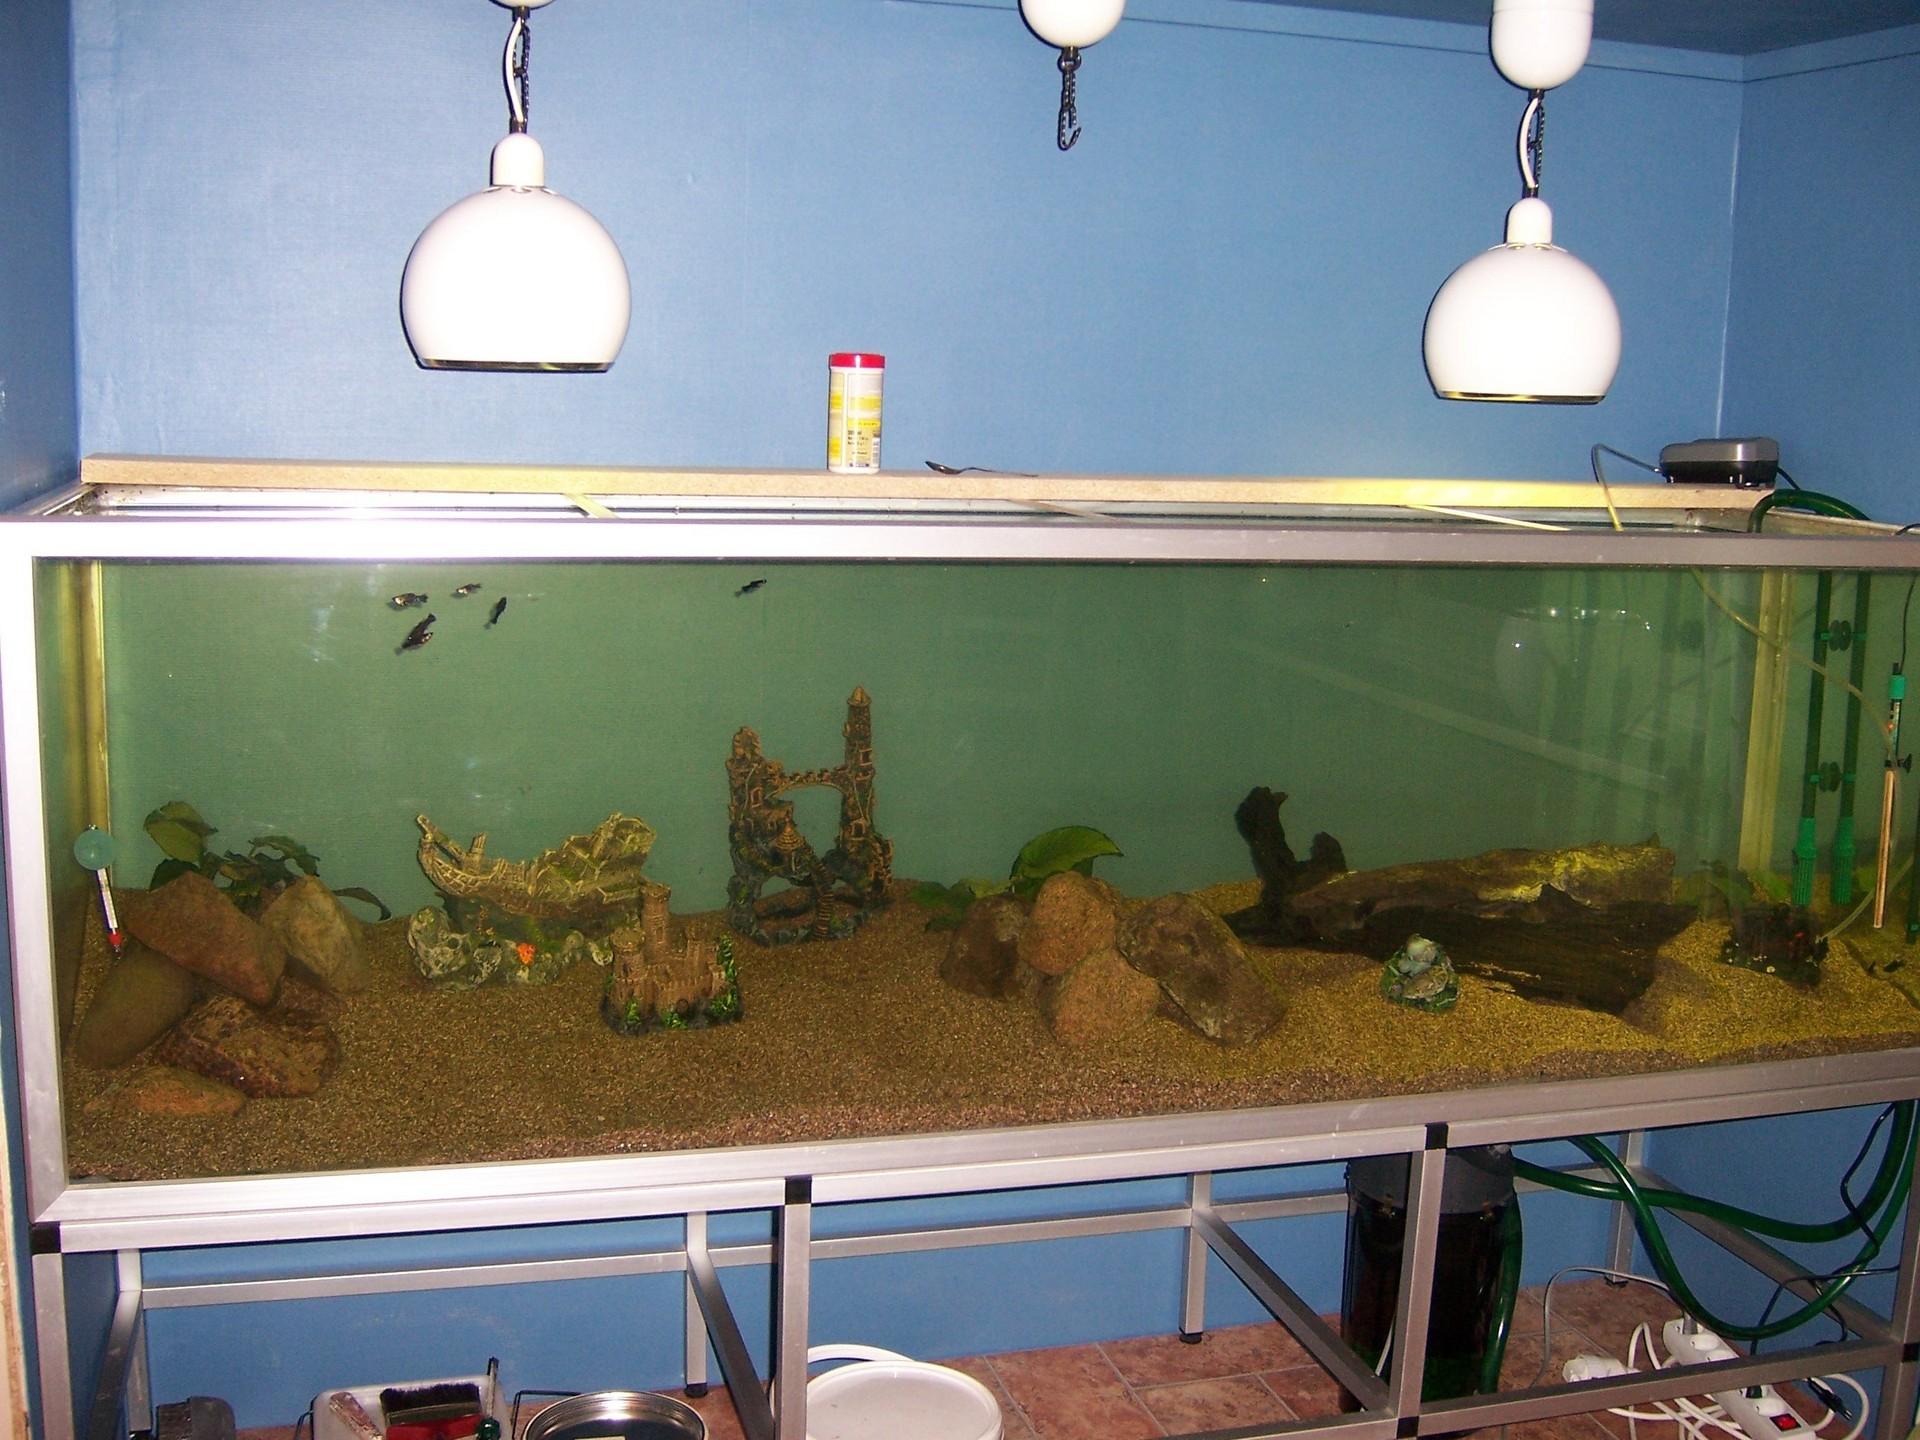 In Wall Aquarium Fish Wallpaper 1145763 Fanpop